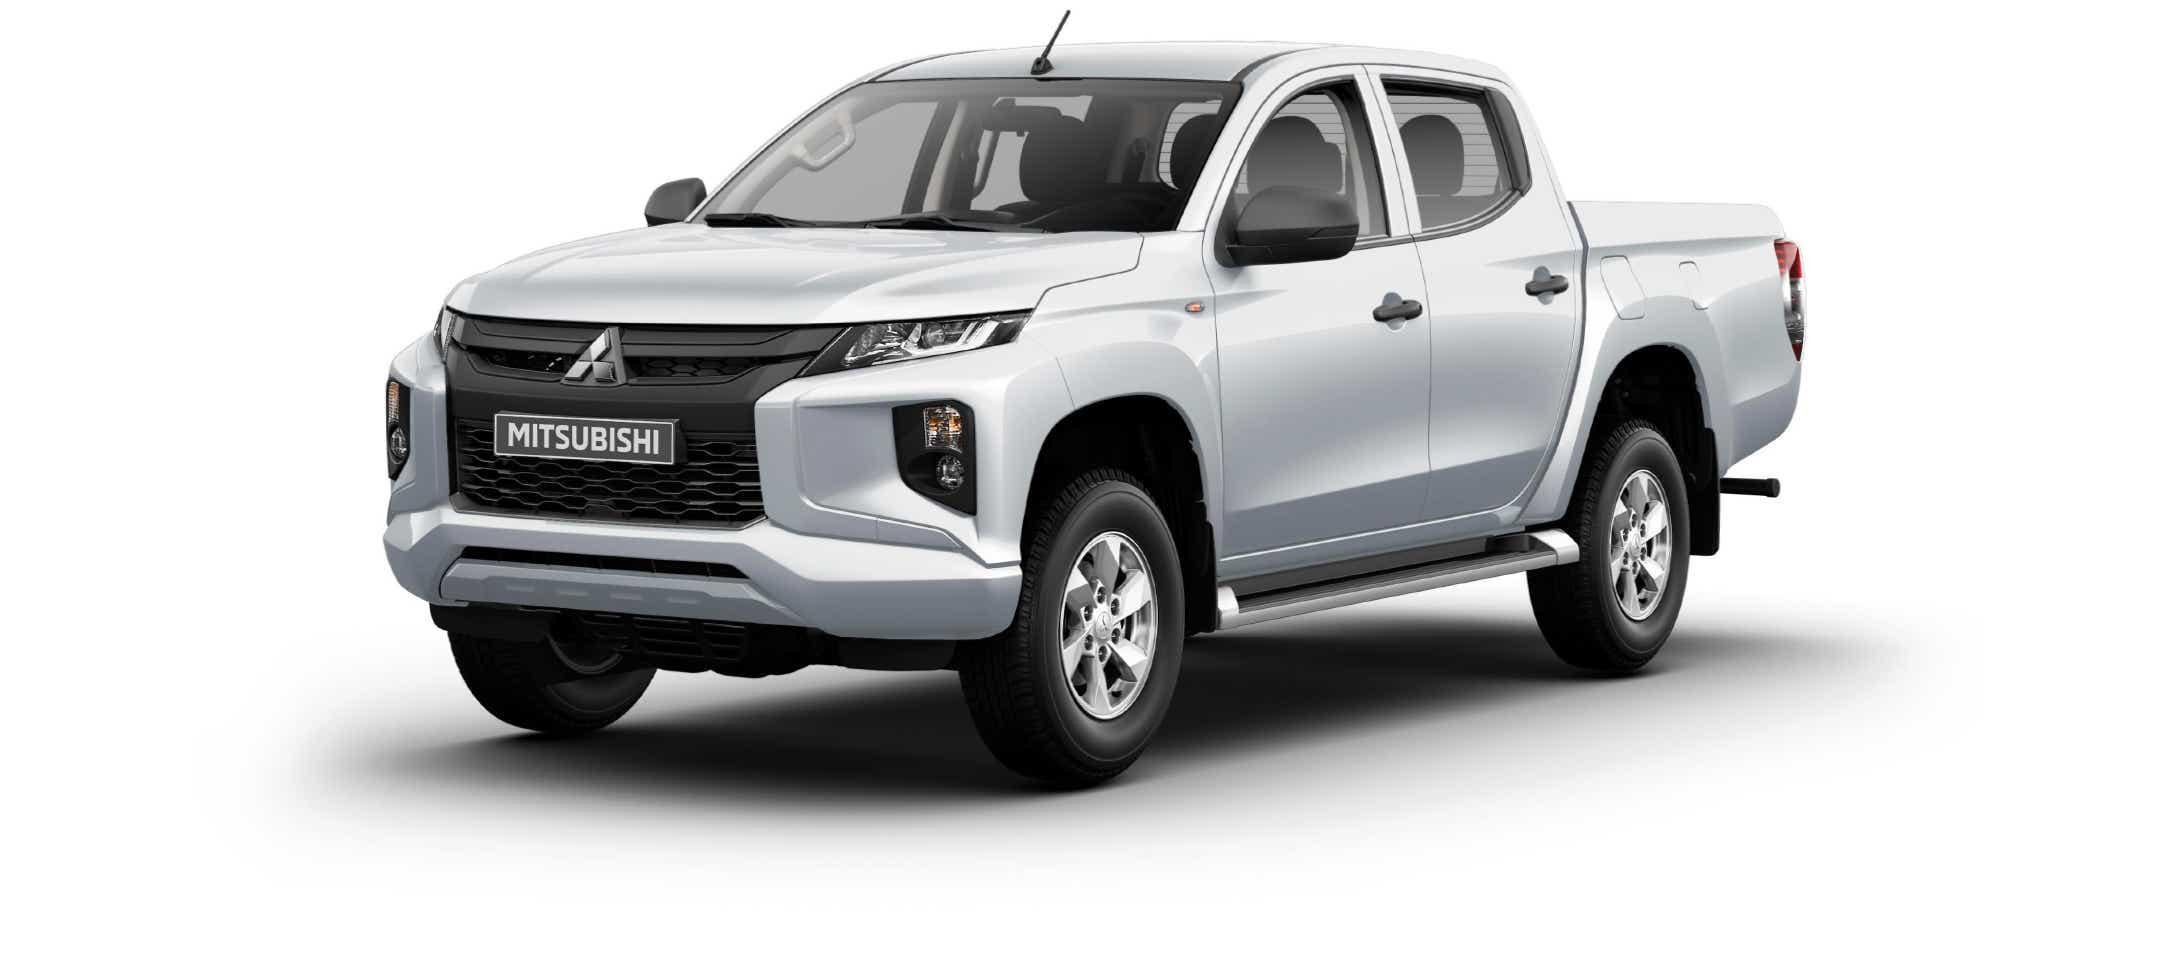 2020 Mitsubishi L200 Concept